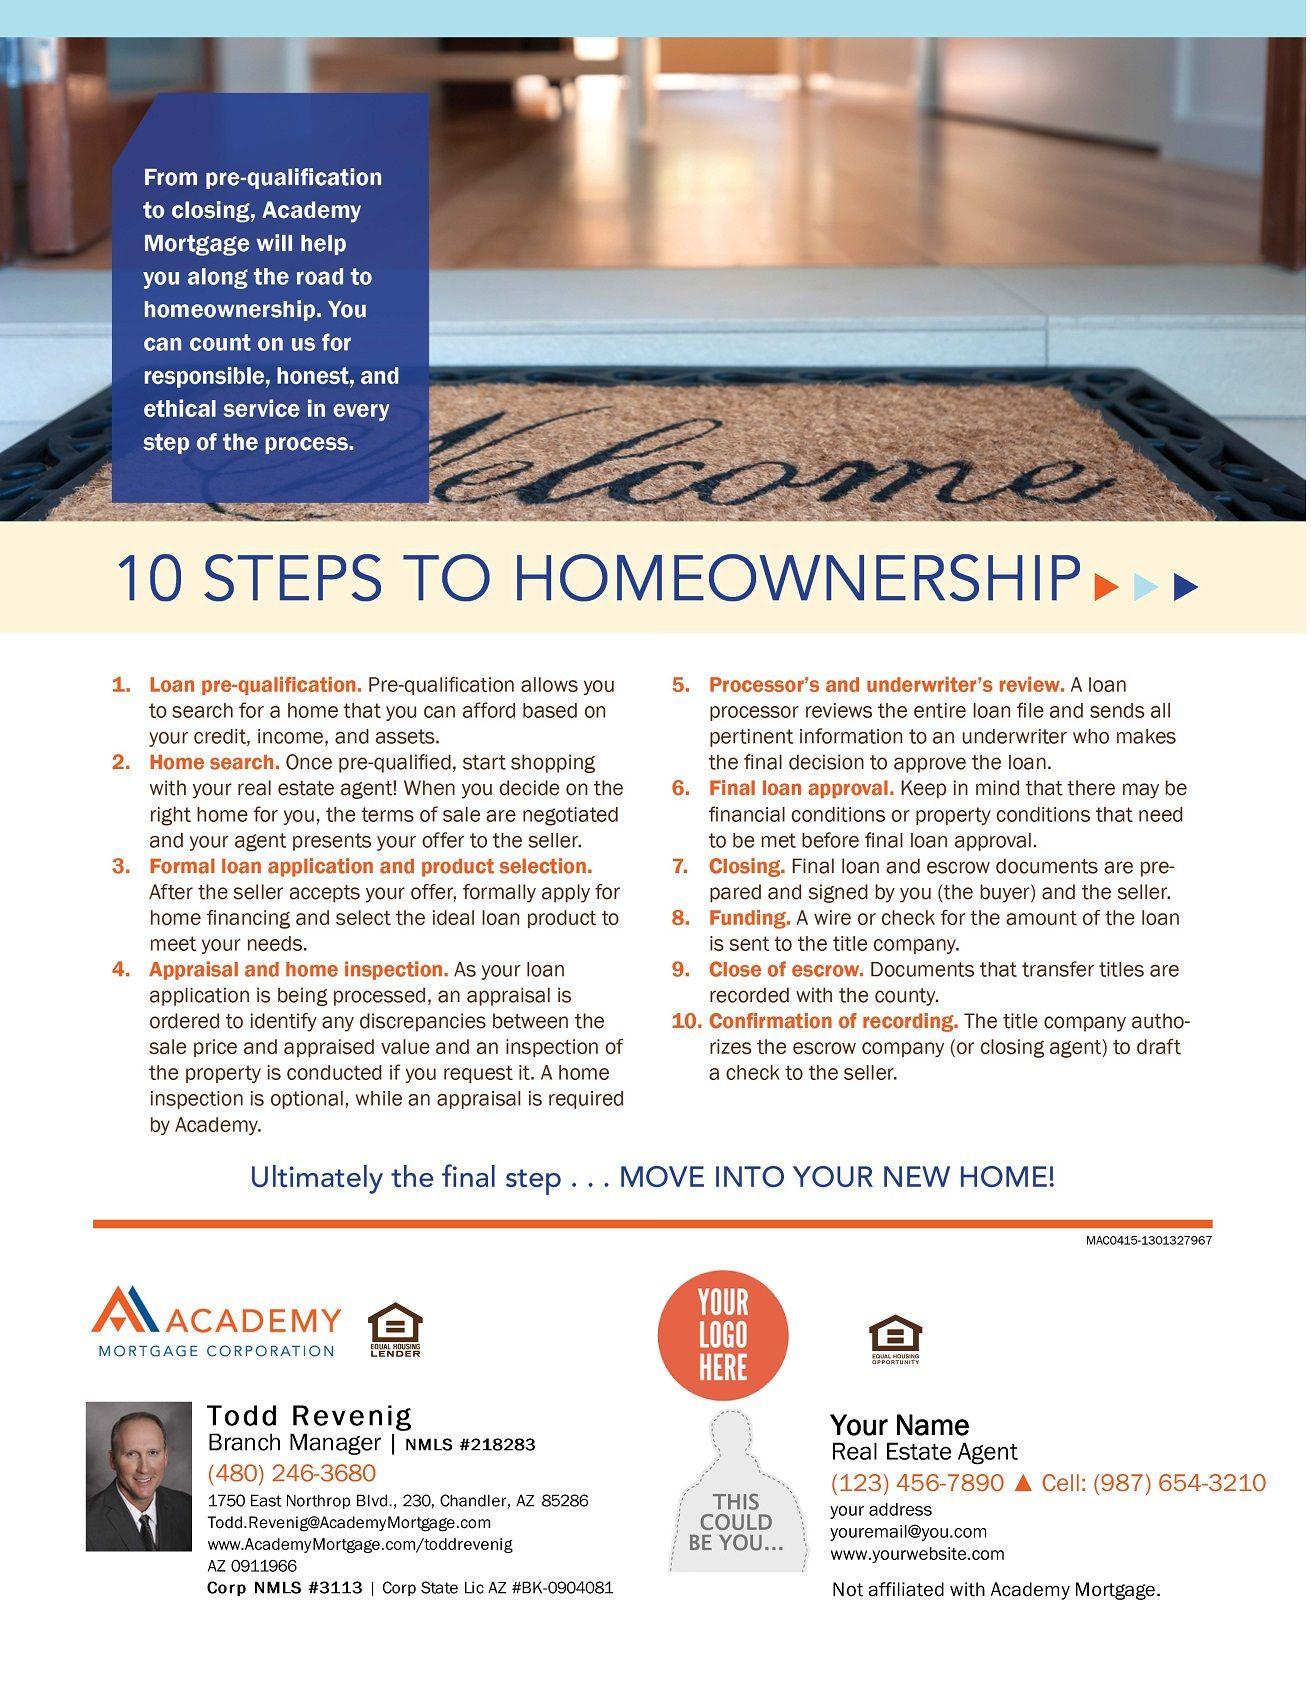 10 Steps To Homeownership Loan Officer Loan Marketing Plan